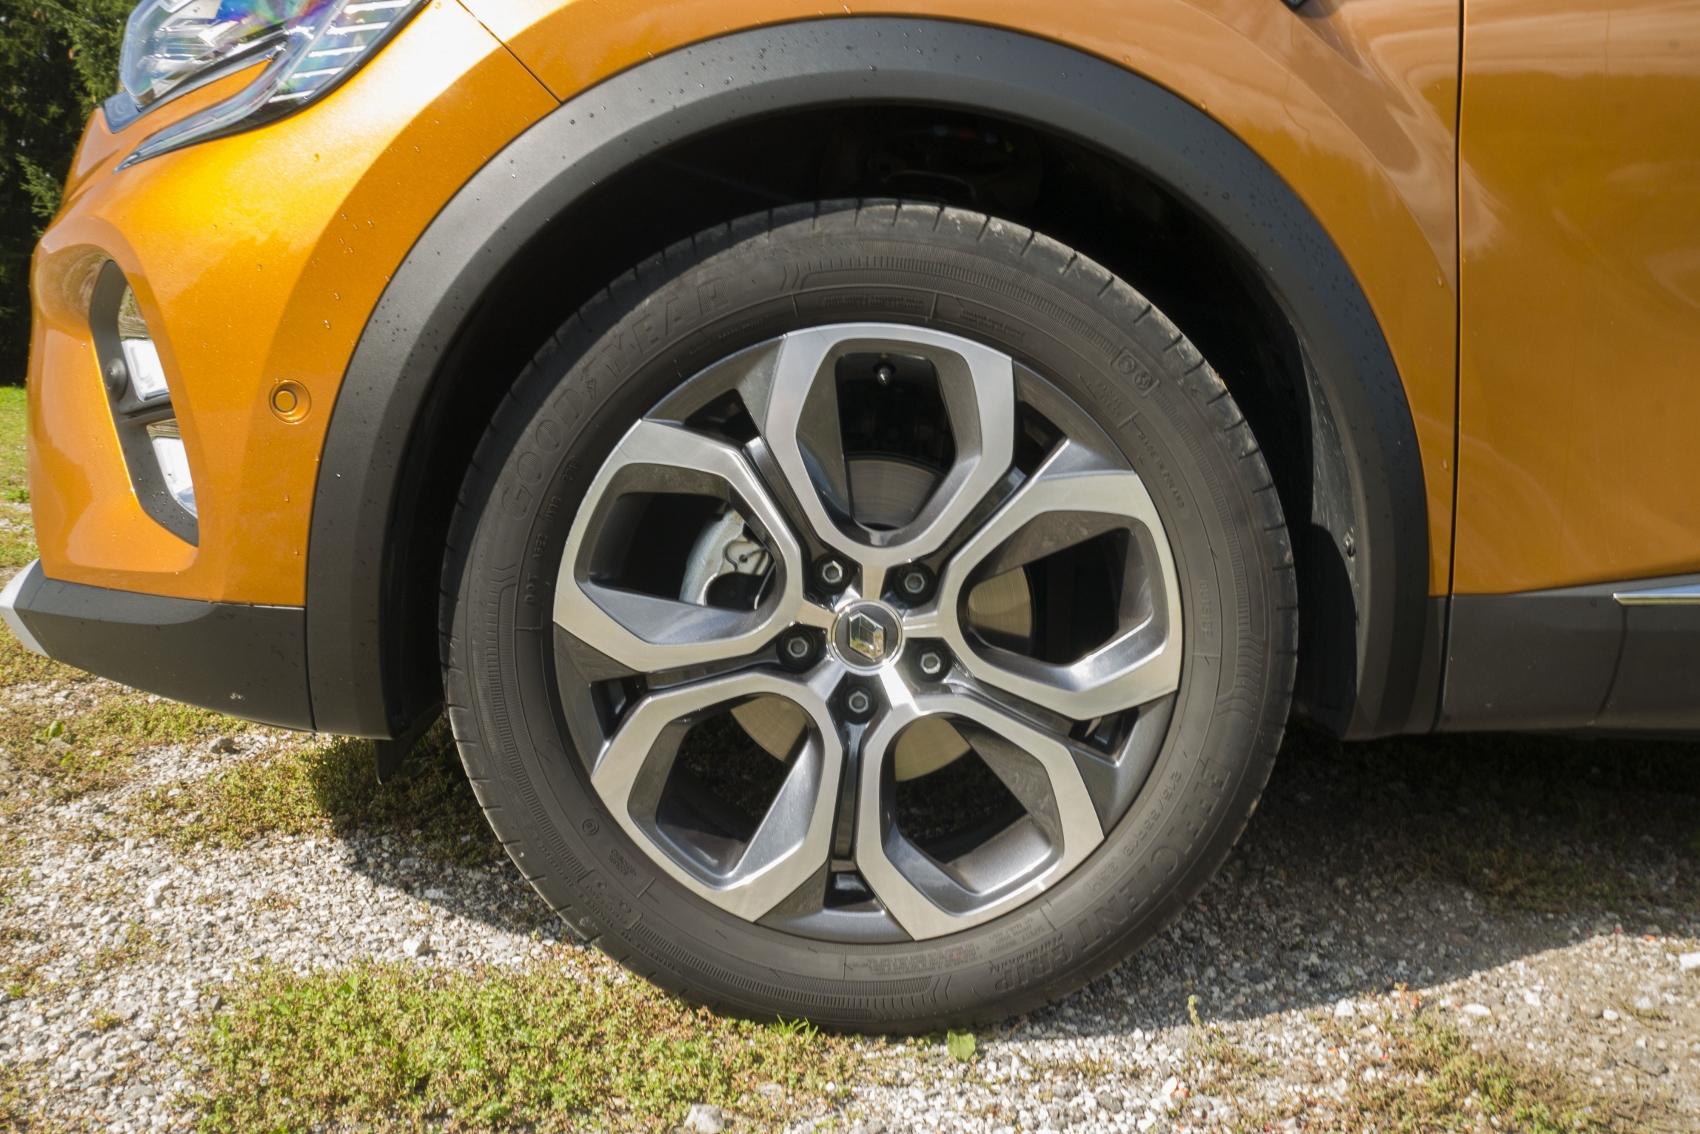 Test: V interiéri sa Renault Captur tvári ako o triedu drahšie auto iTBO3xJkAX renault-captur-4